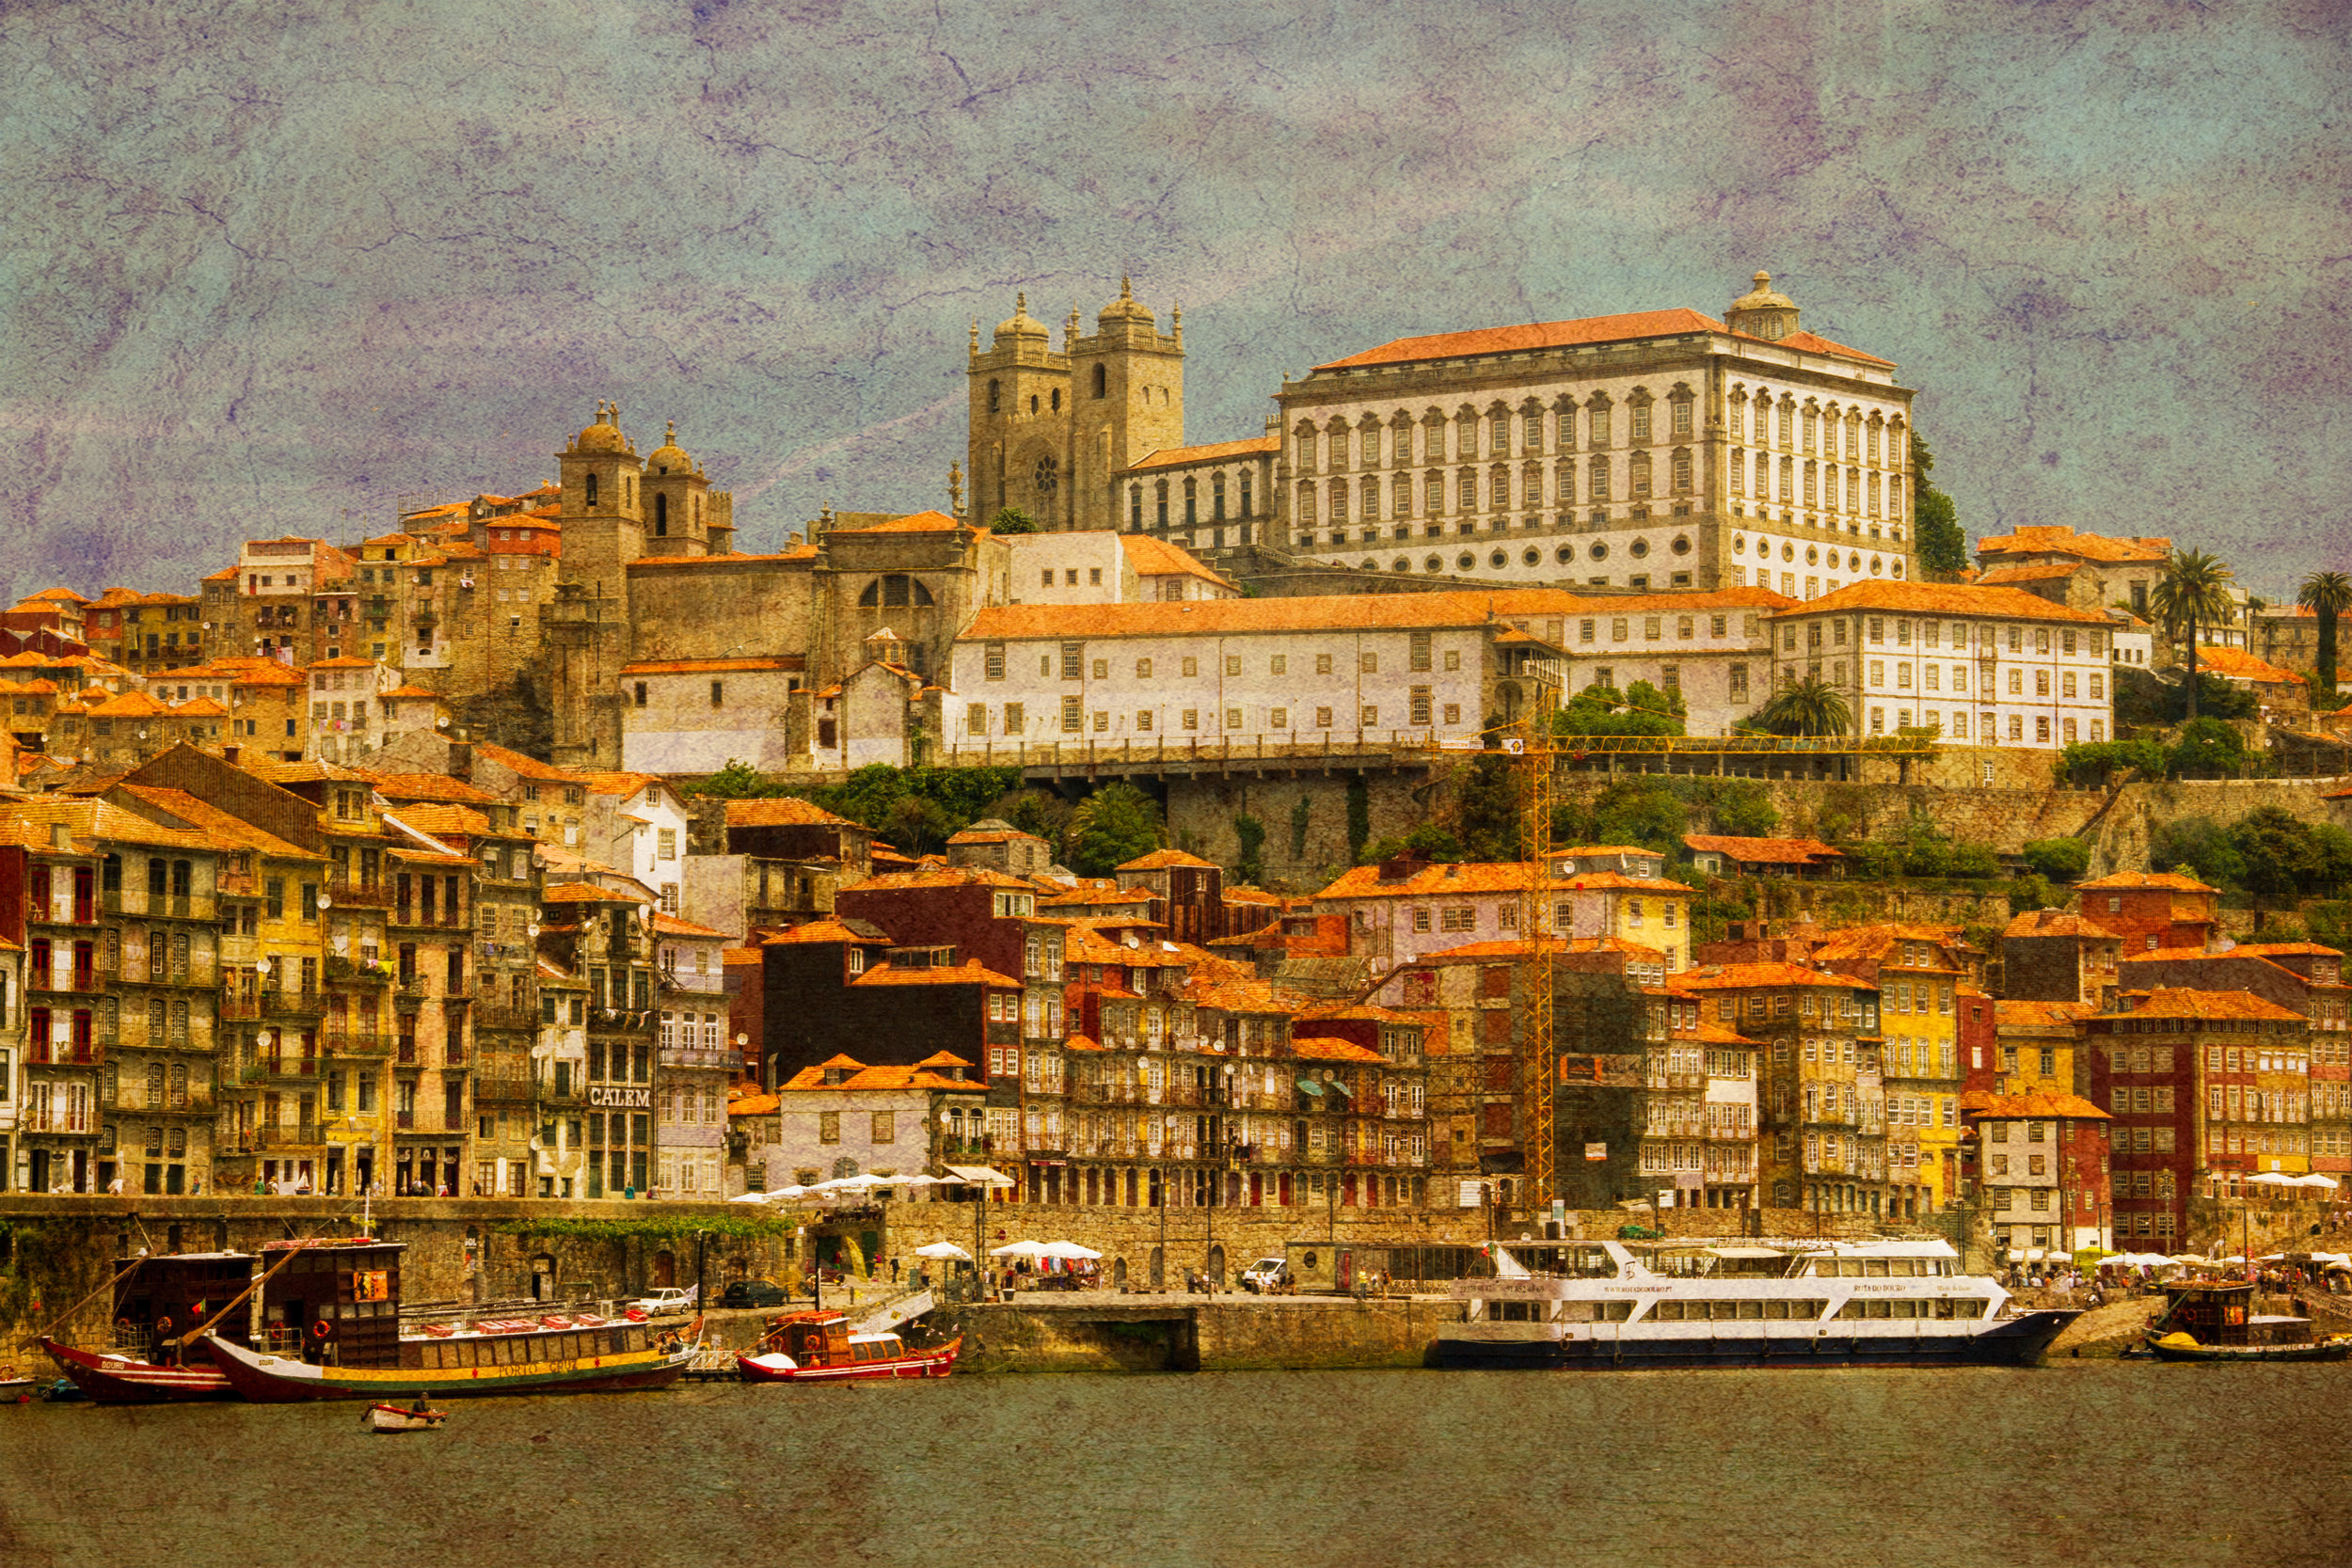 """Porta, Portugal"" by Sid Webb, Photograph, 12x18in, 2018, $125"